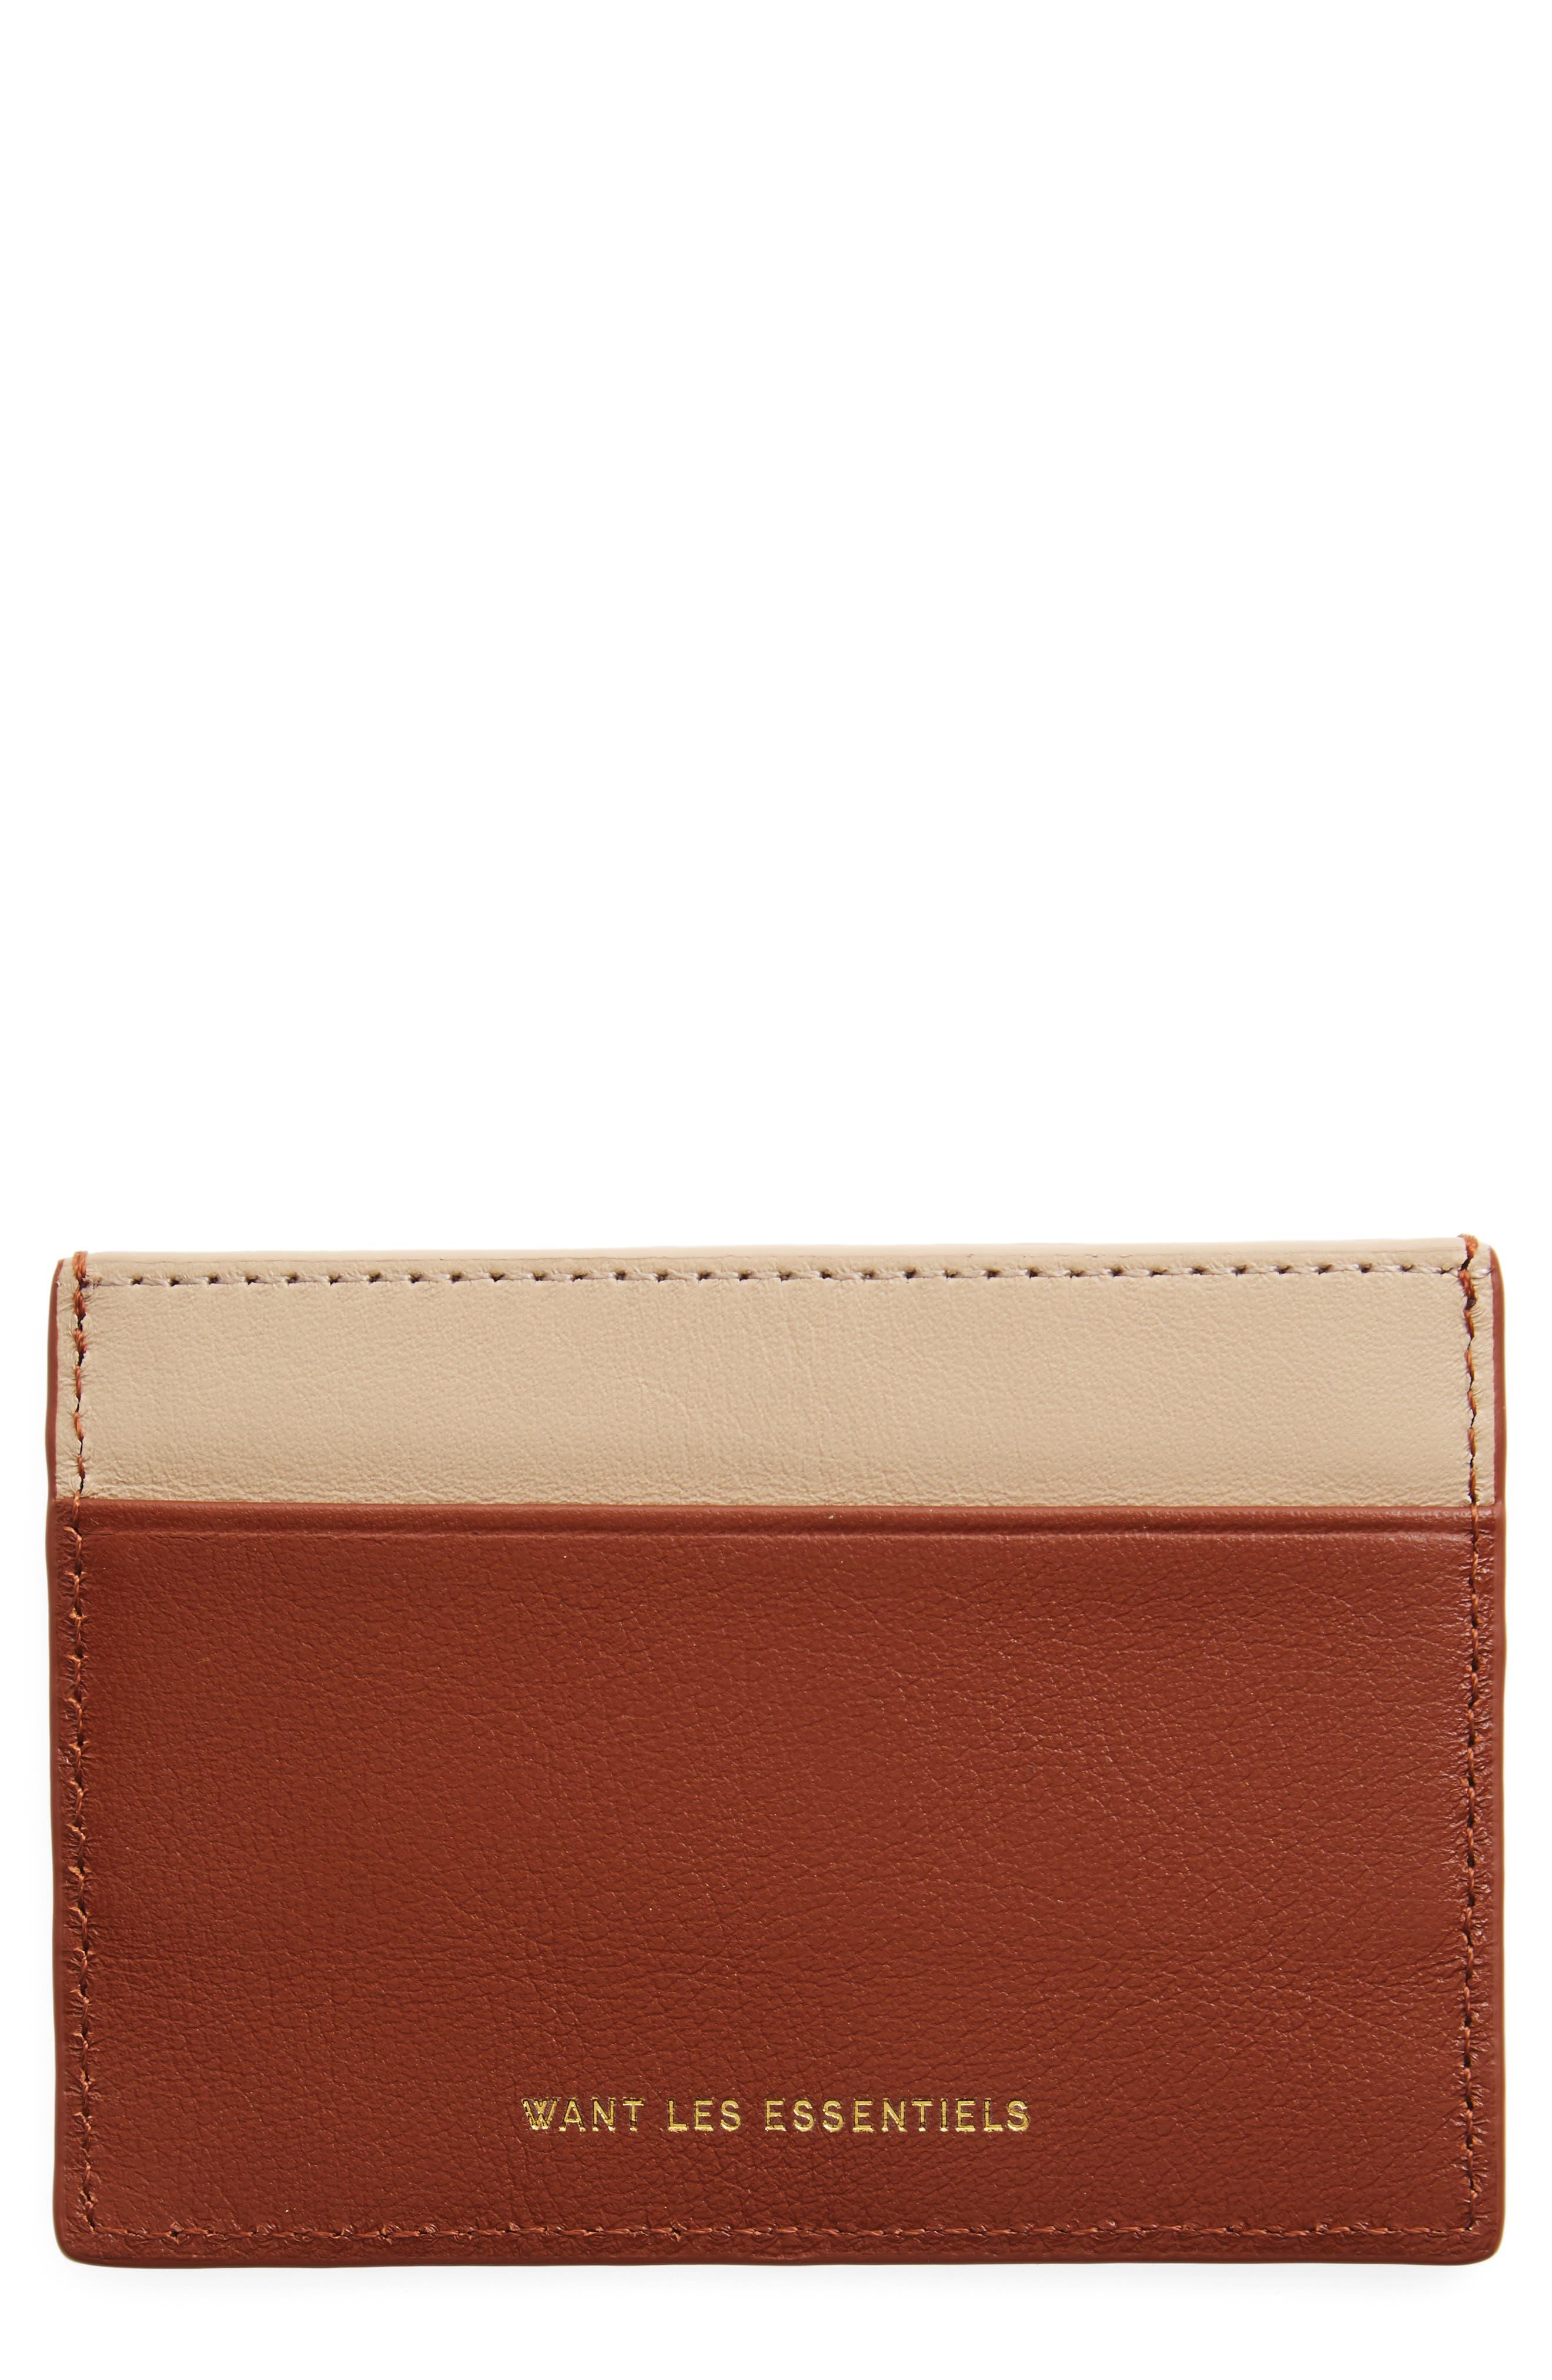 WANT LES ESSENTIELS Branson Leather Card, Main, color, 212